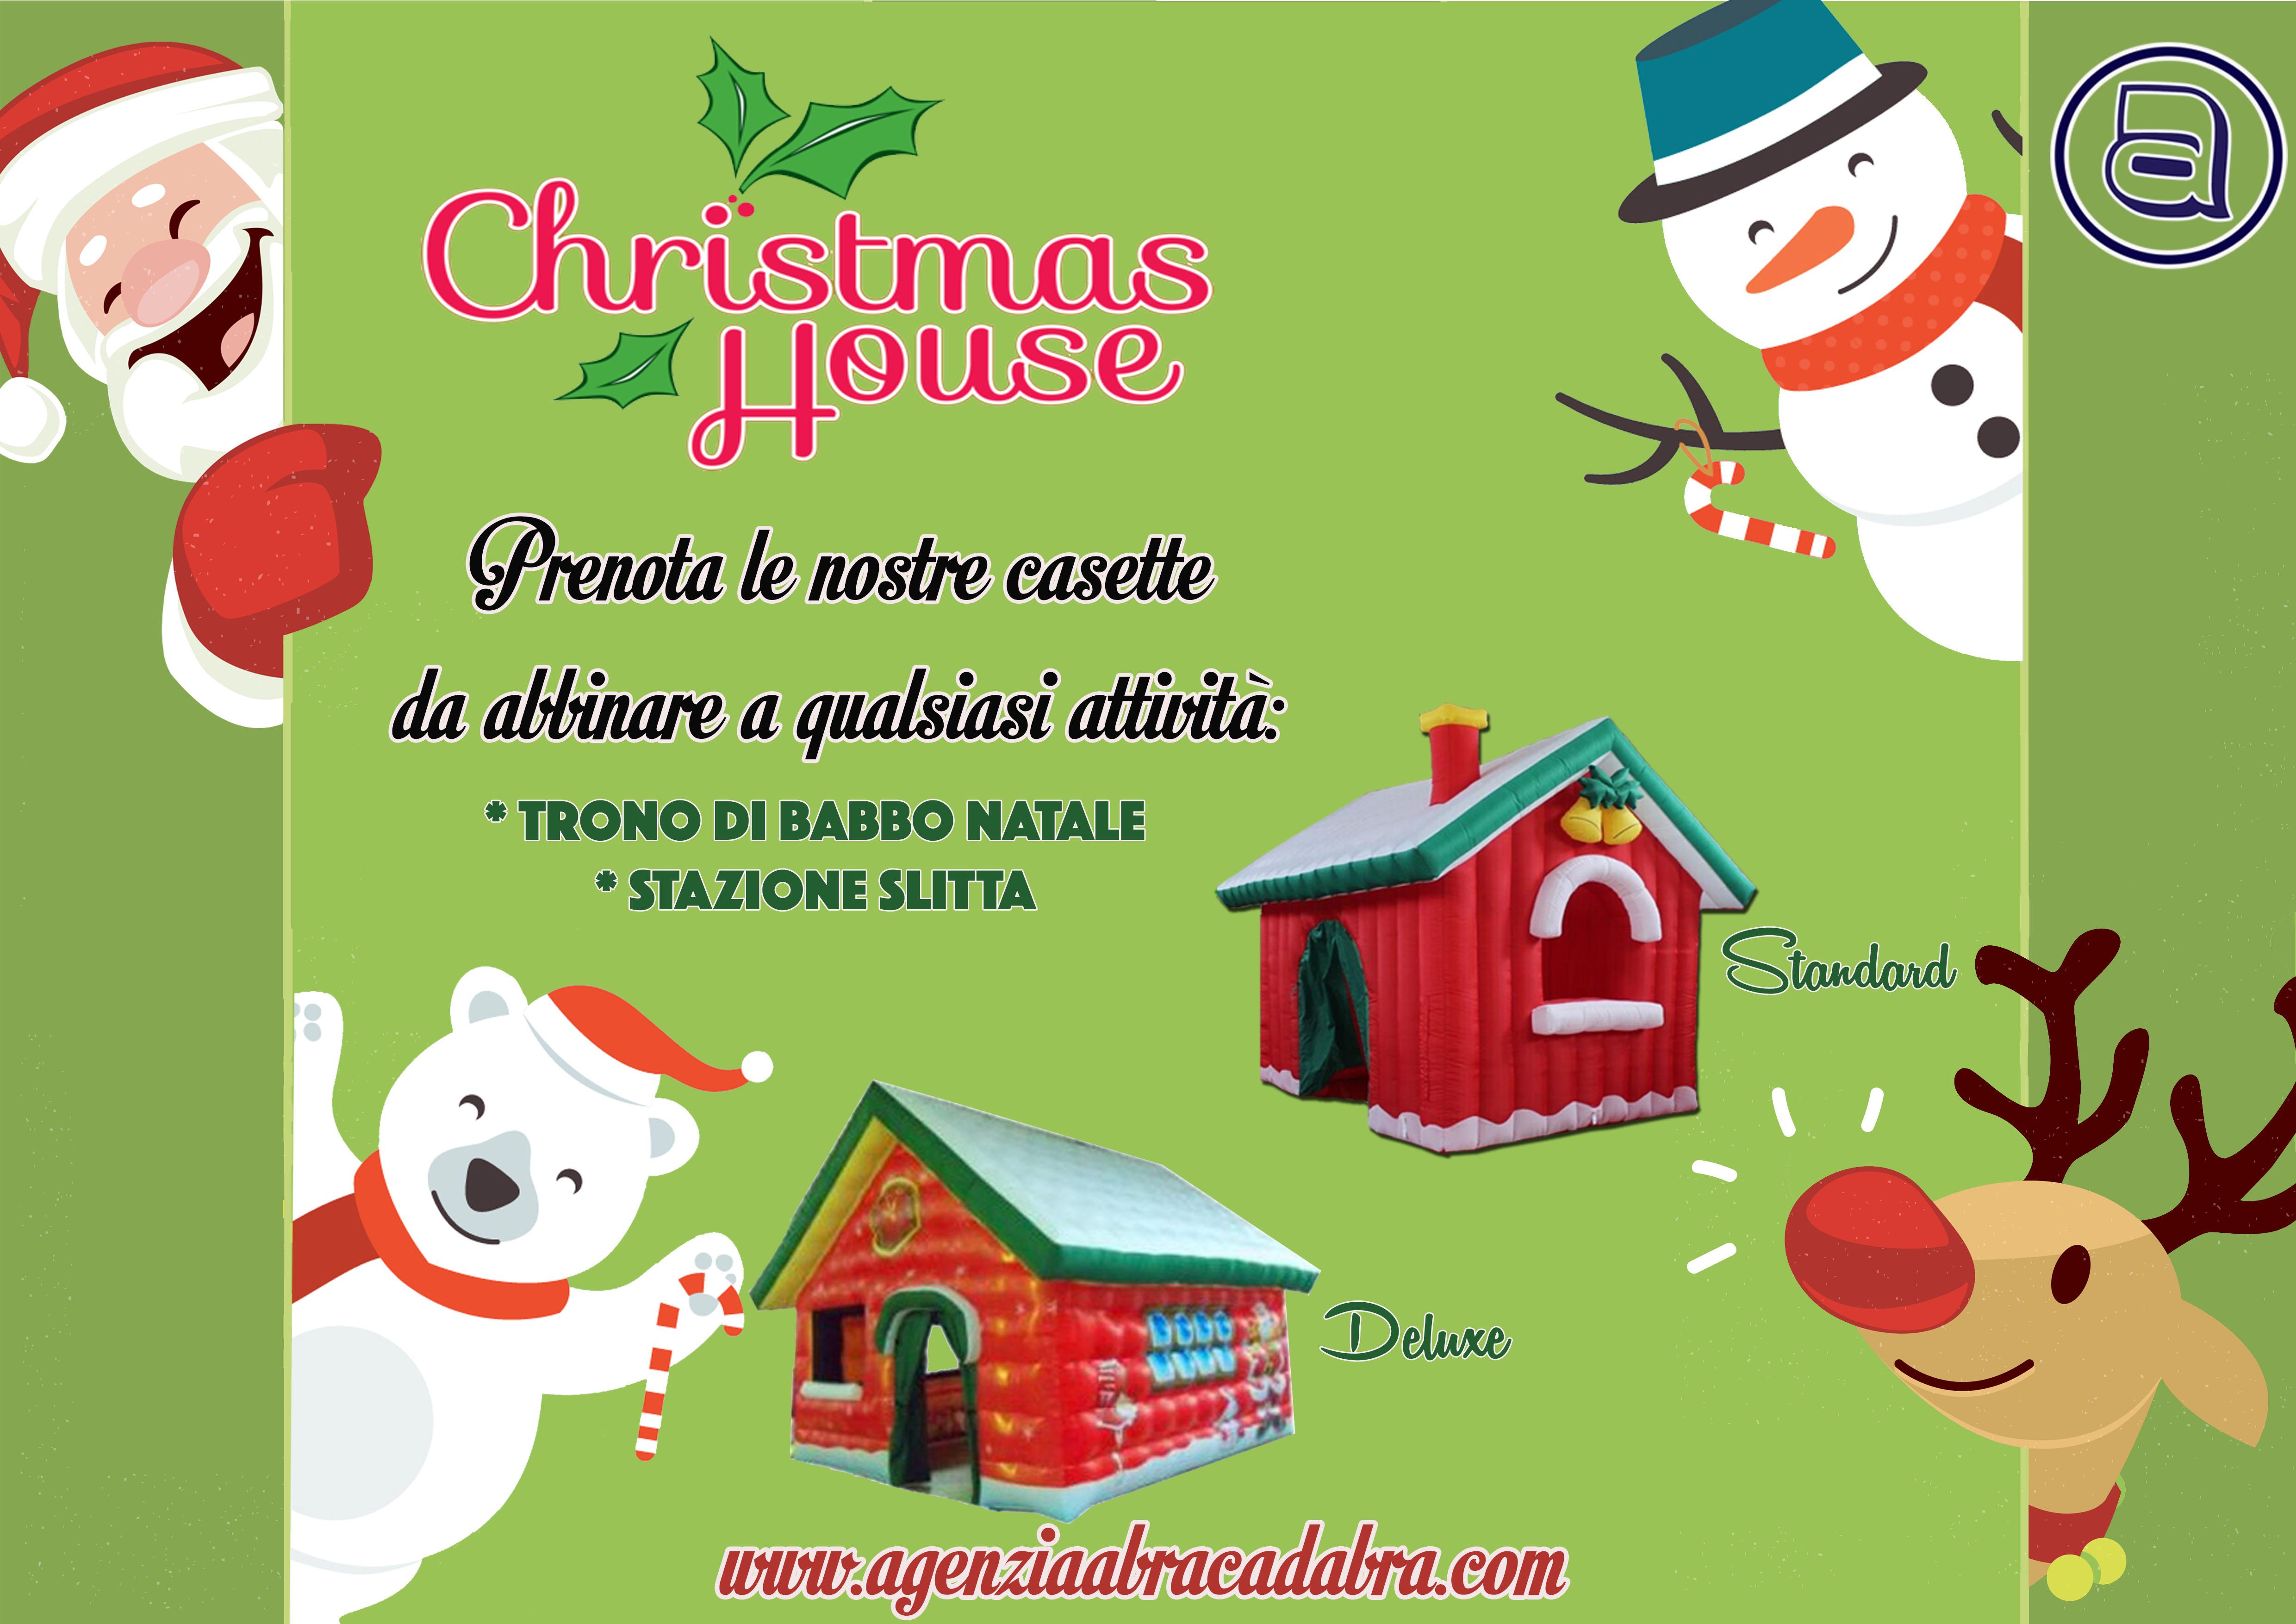 5-christmashouse